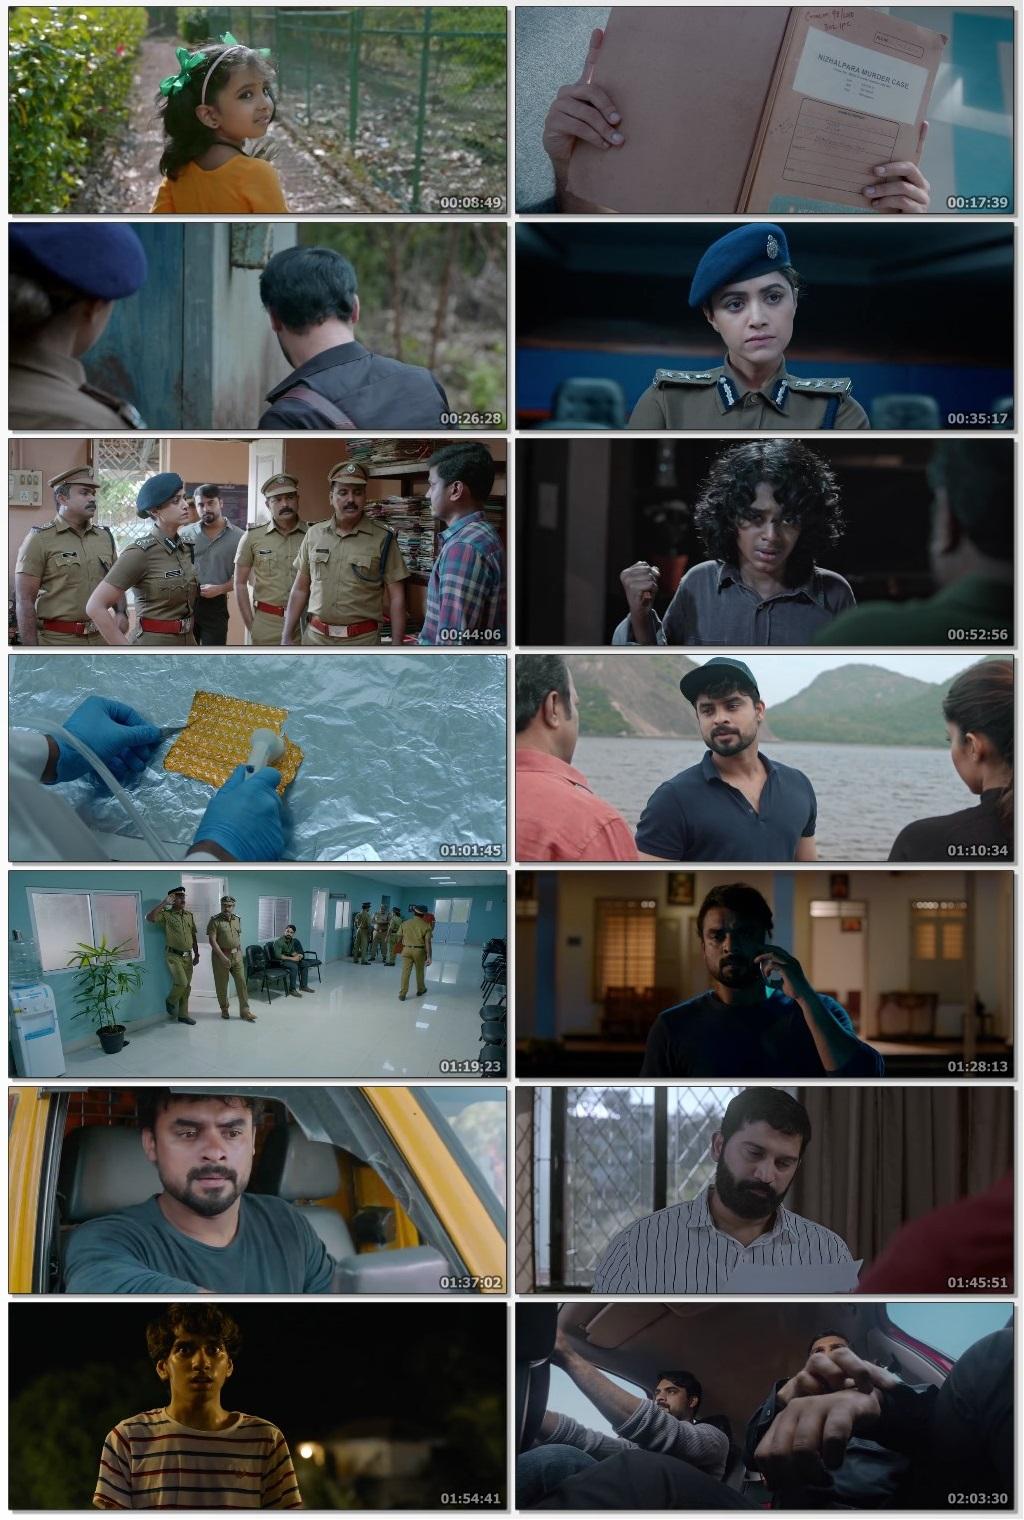 Forensic 2020 Full Movie Malayalam 720p Hdrip Esubs Download 7starhd Name 7starhd Unbl4you London